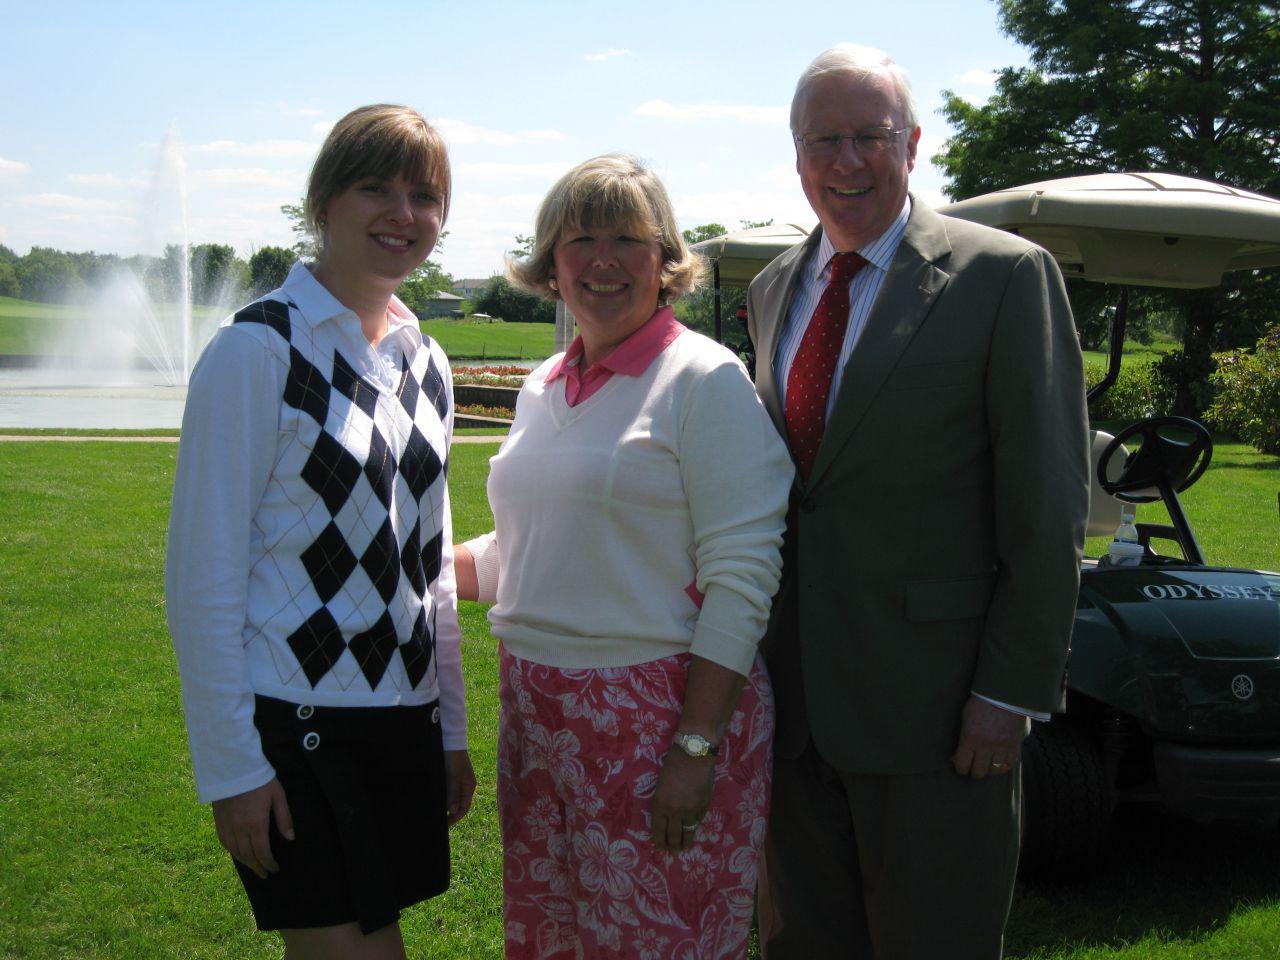 YLD Chair Kelley Gandurski, Board of Governors member Paula Holderman and ISBA President John O'Brien